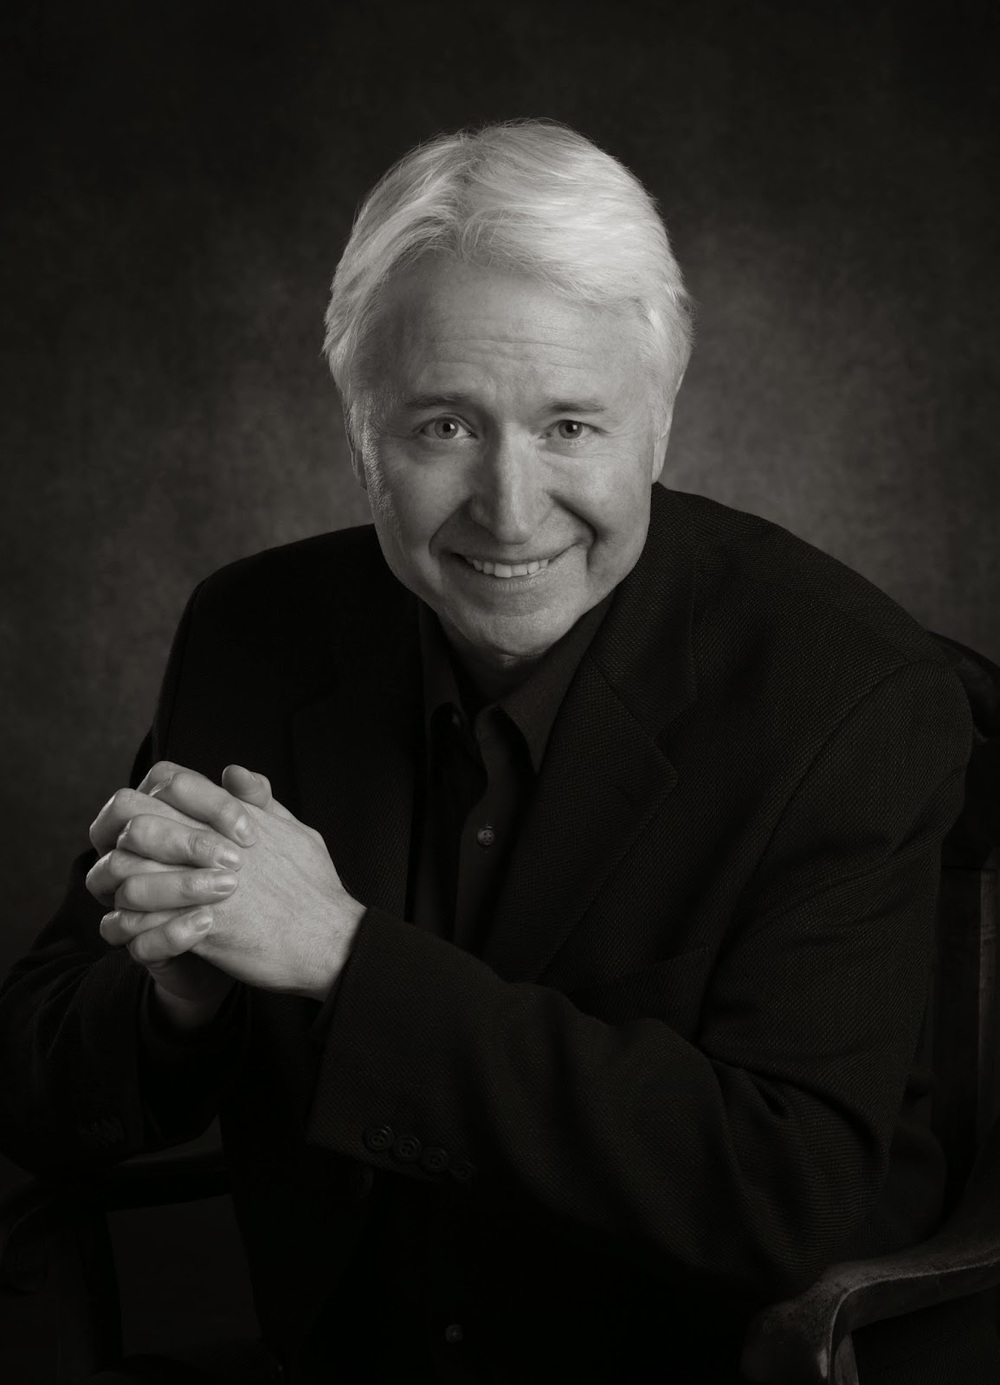 J.R. Sullivan